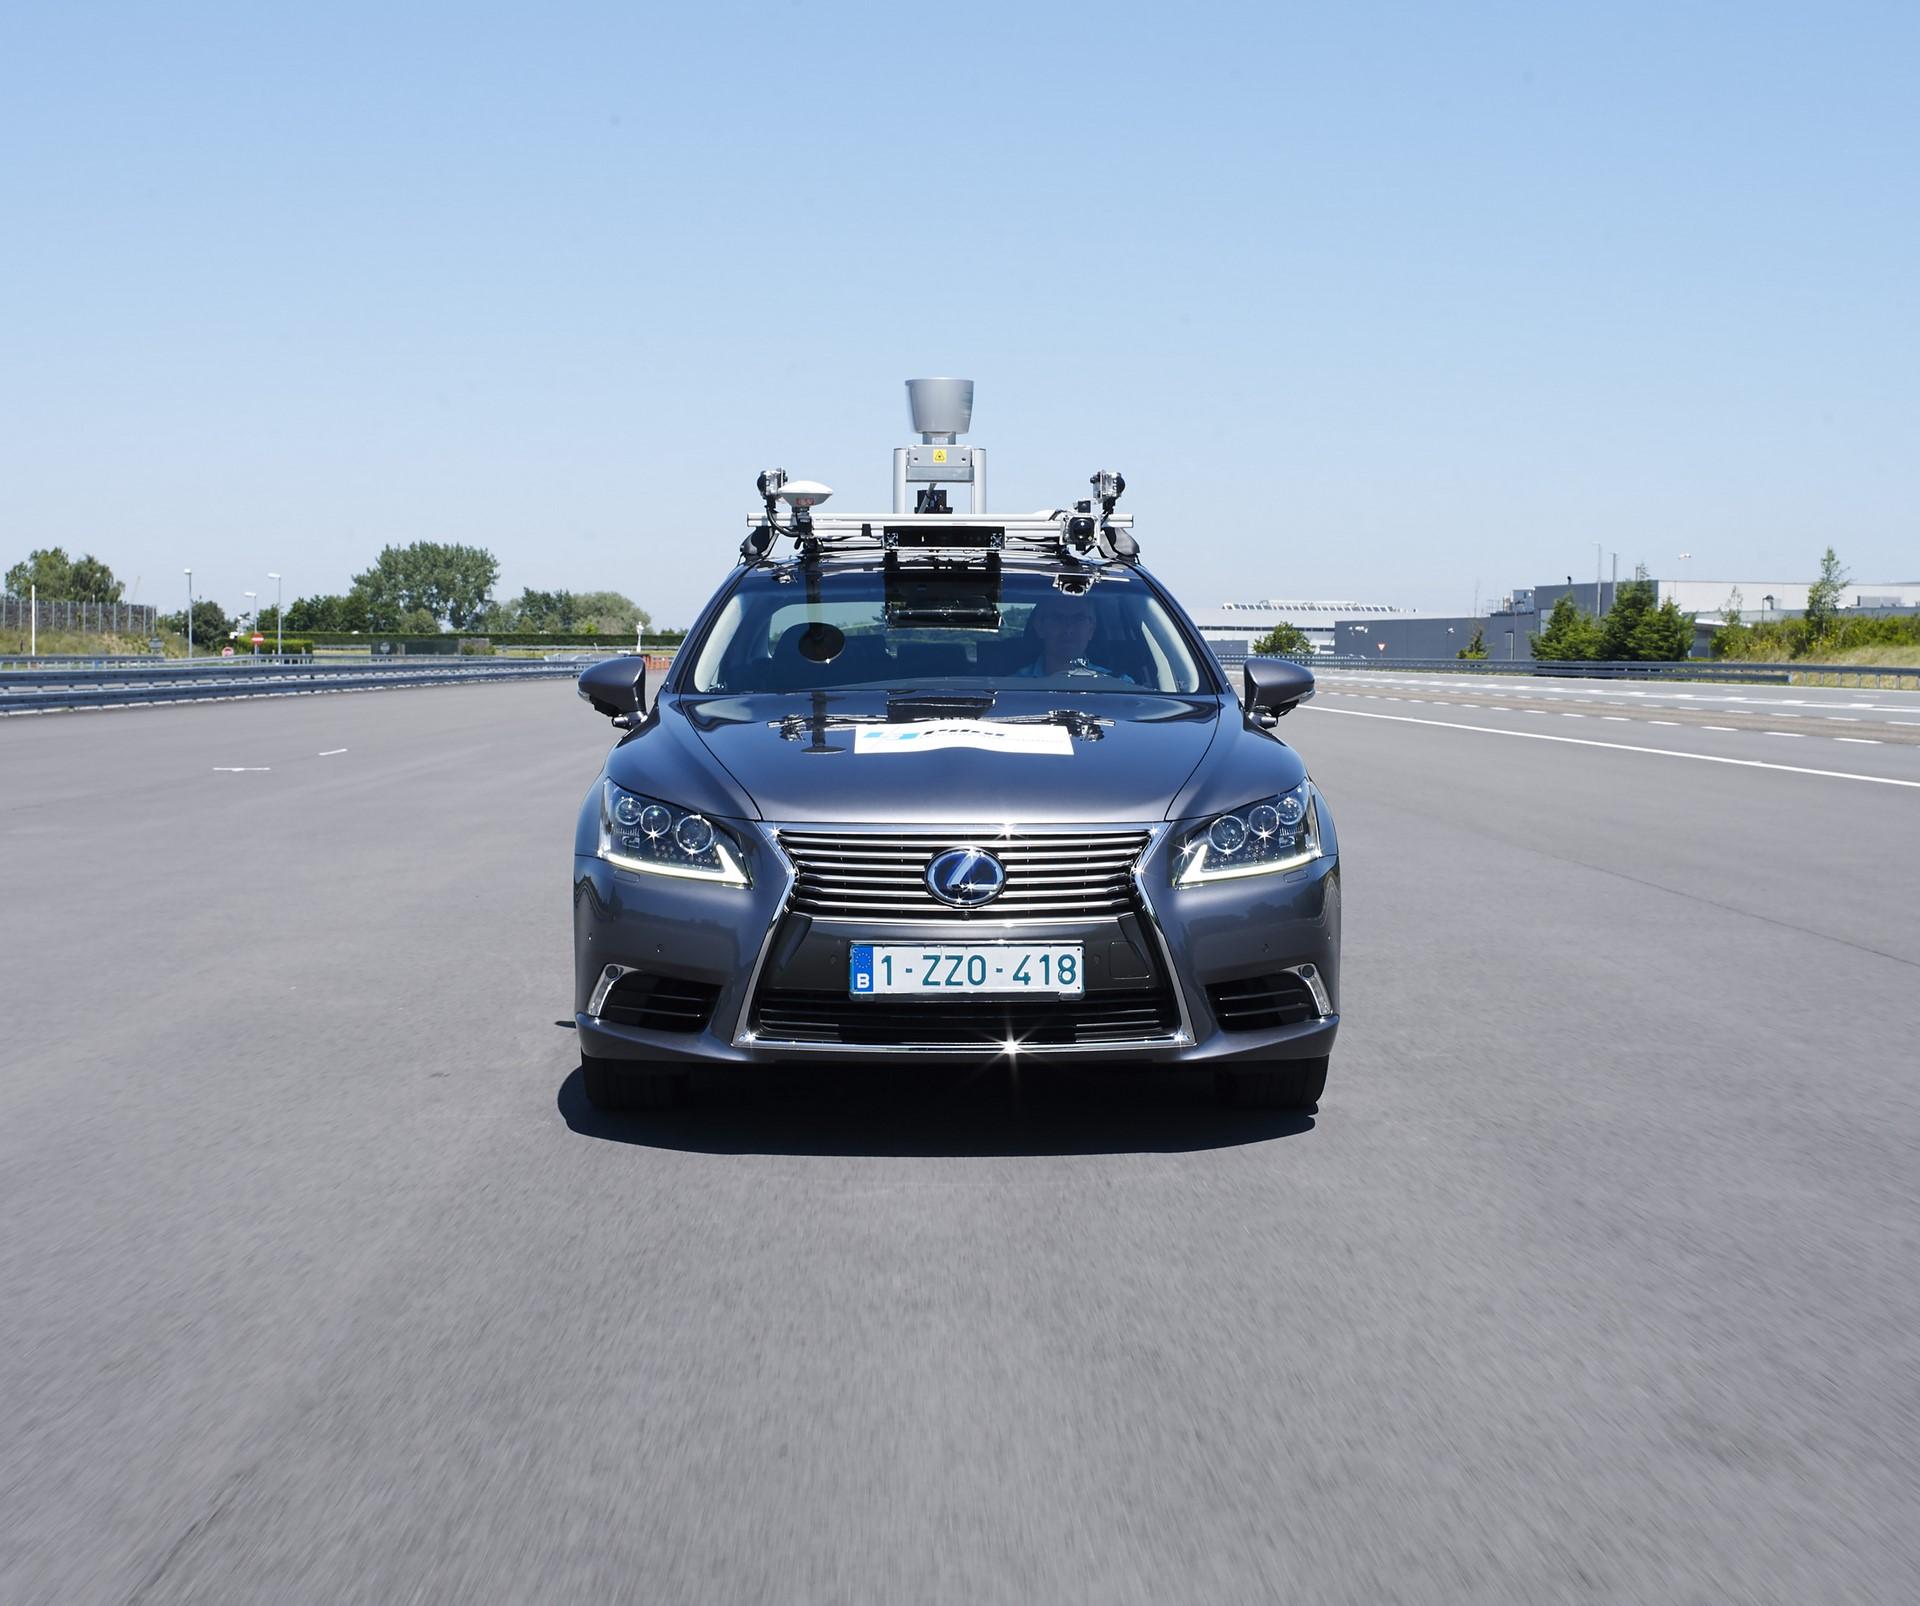 Toyota-Autonomous-Europe-Lexus-LS-9